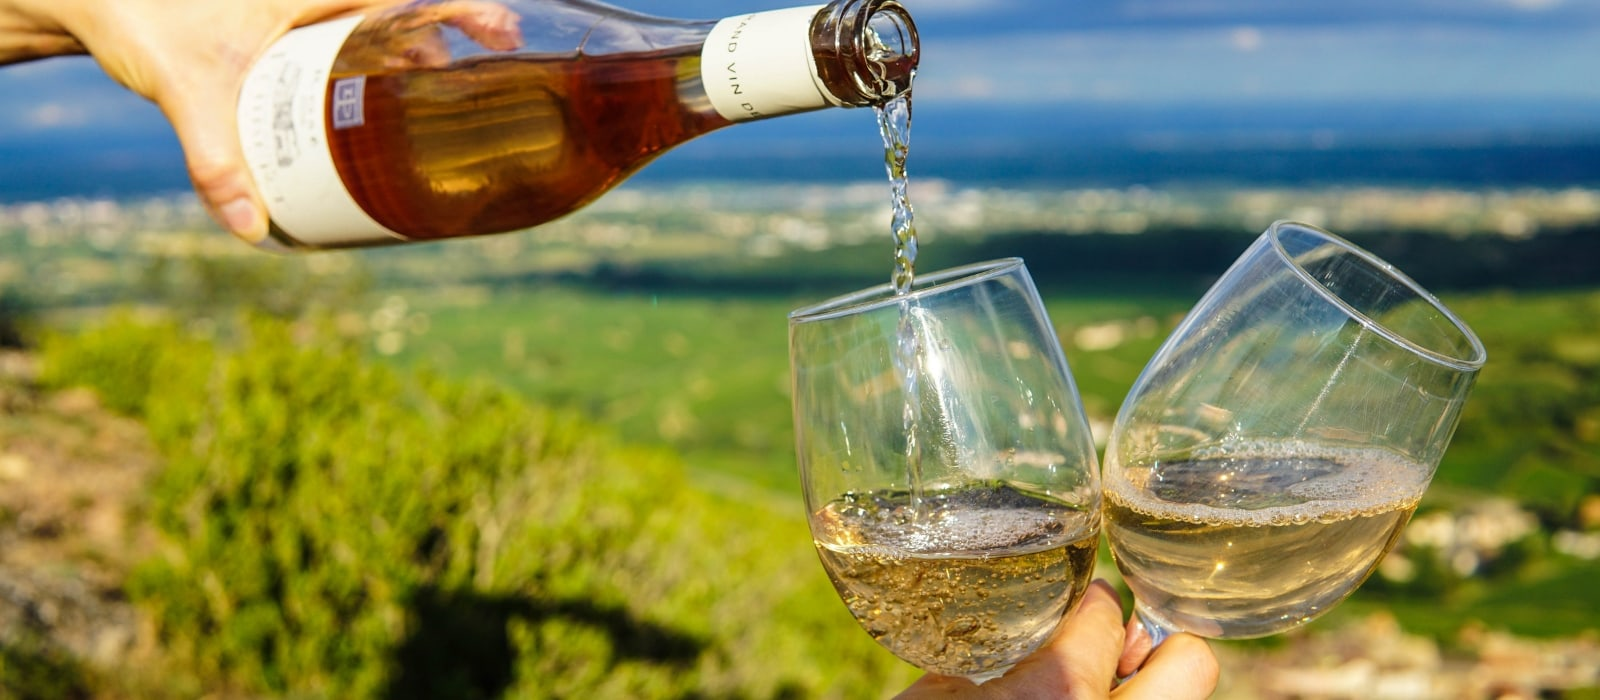 Where to Go Wine Tasting in Temecula| Wine Tasting in California| Wine Tasting in Temecula, California| Temecula Wine Tasting| Best Wine Tasting in Temecula| Wine Tasting Tour| Wine Tasting| #winetasting #wine #california #temecula #travel #winetravel